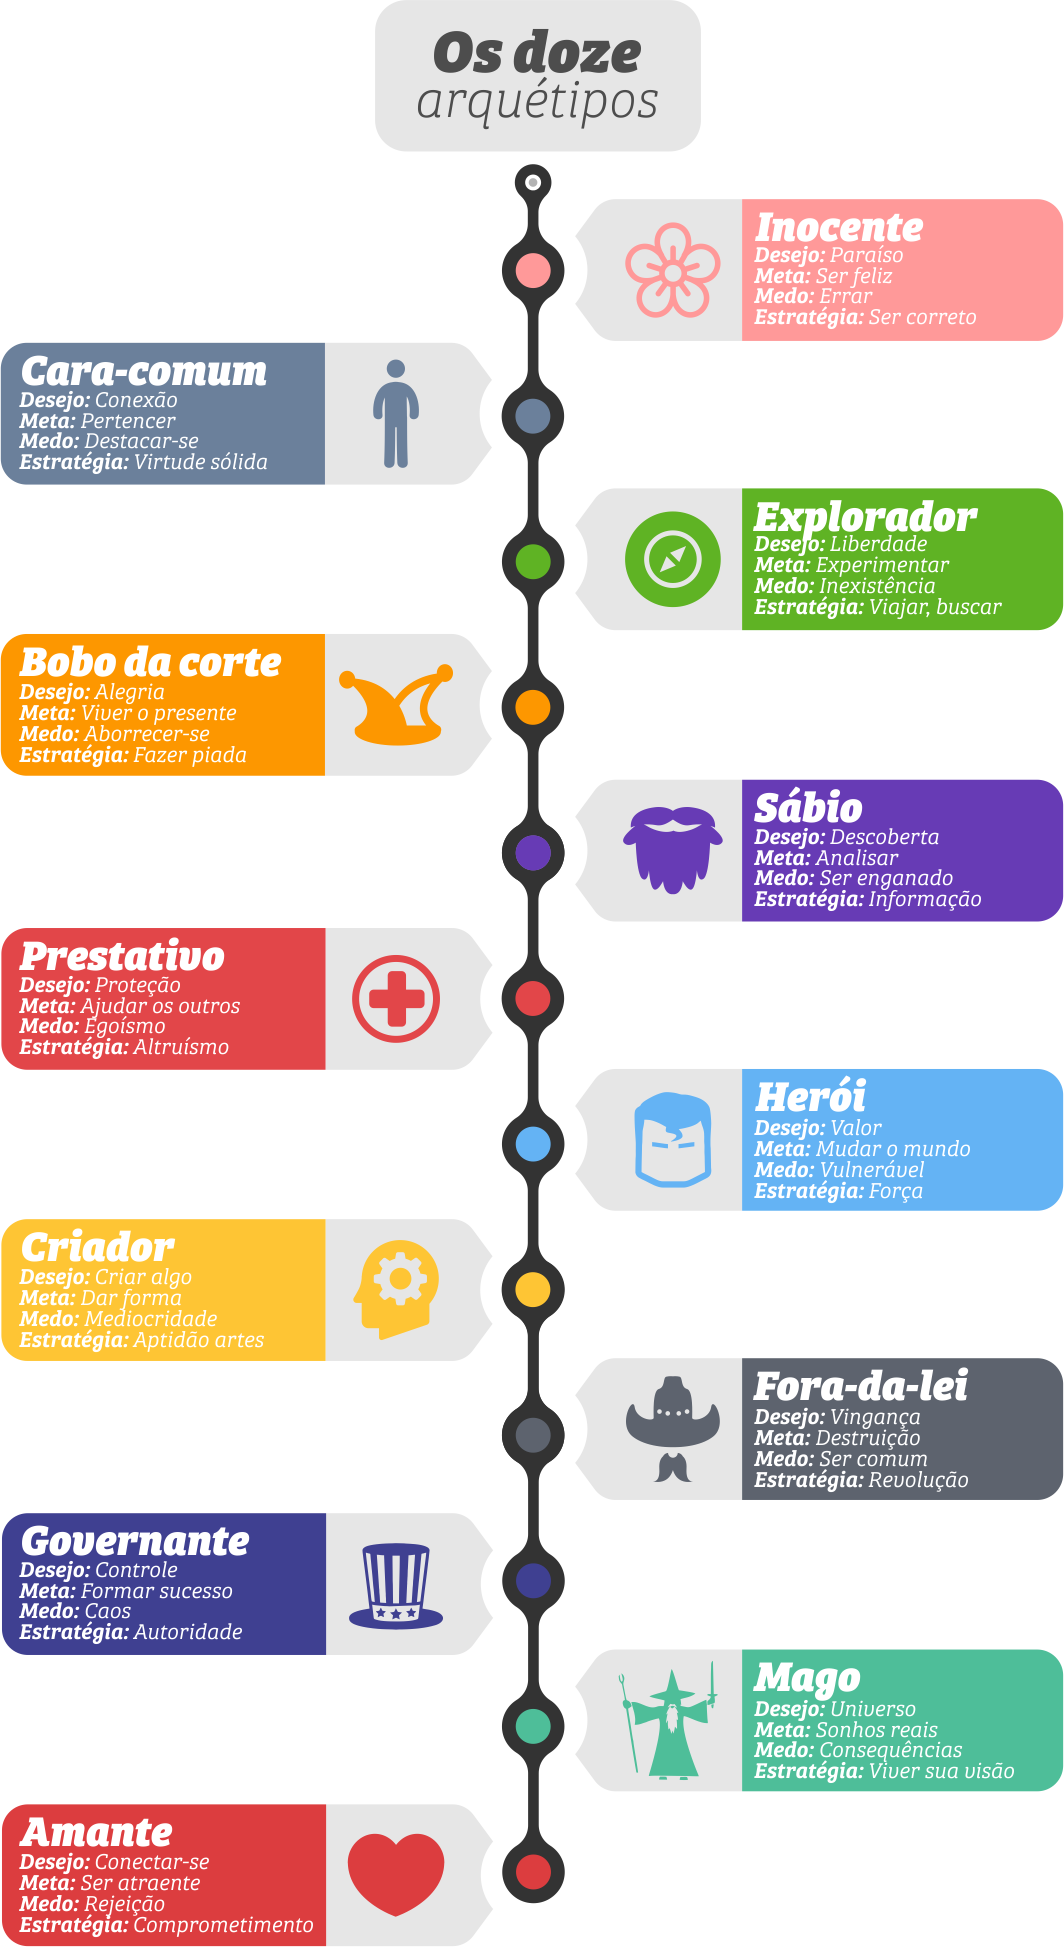 Infográfico - Os doze arquétipos